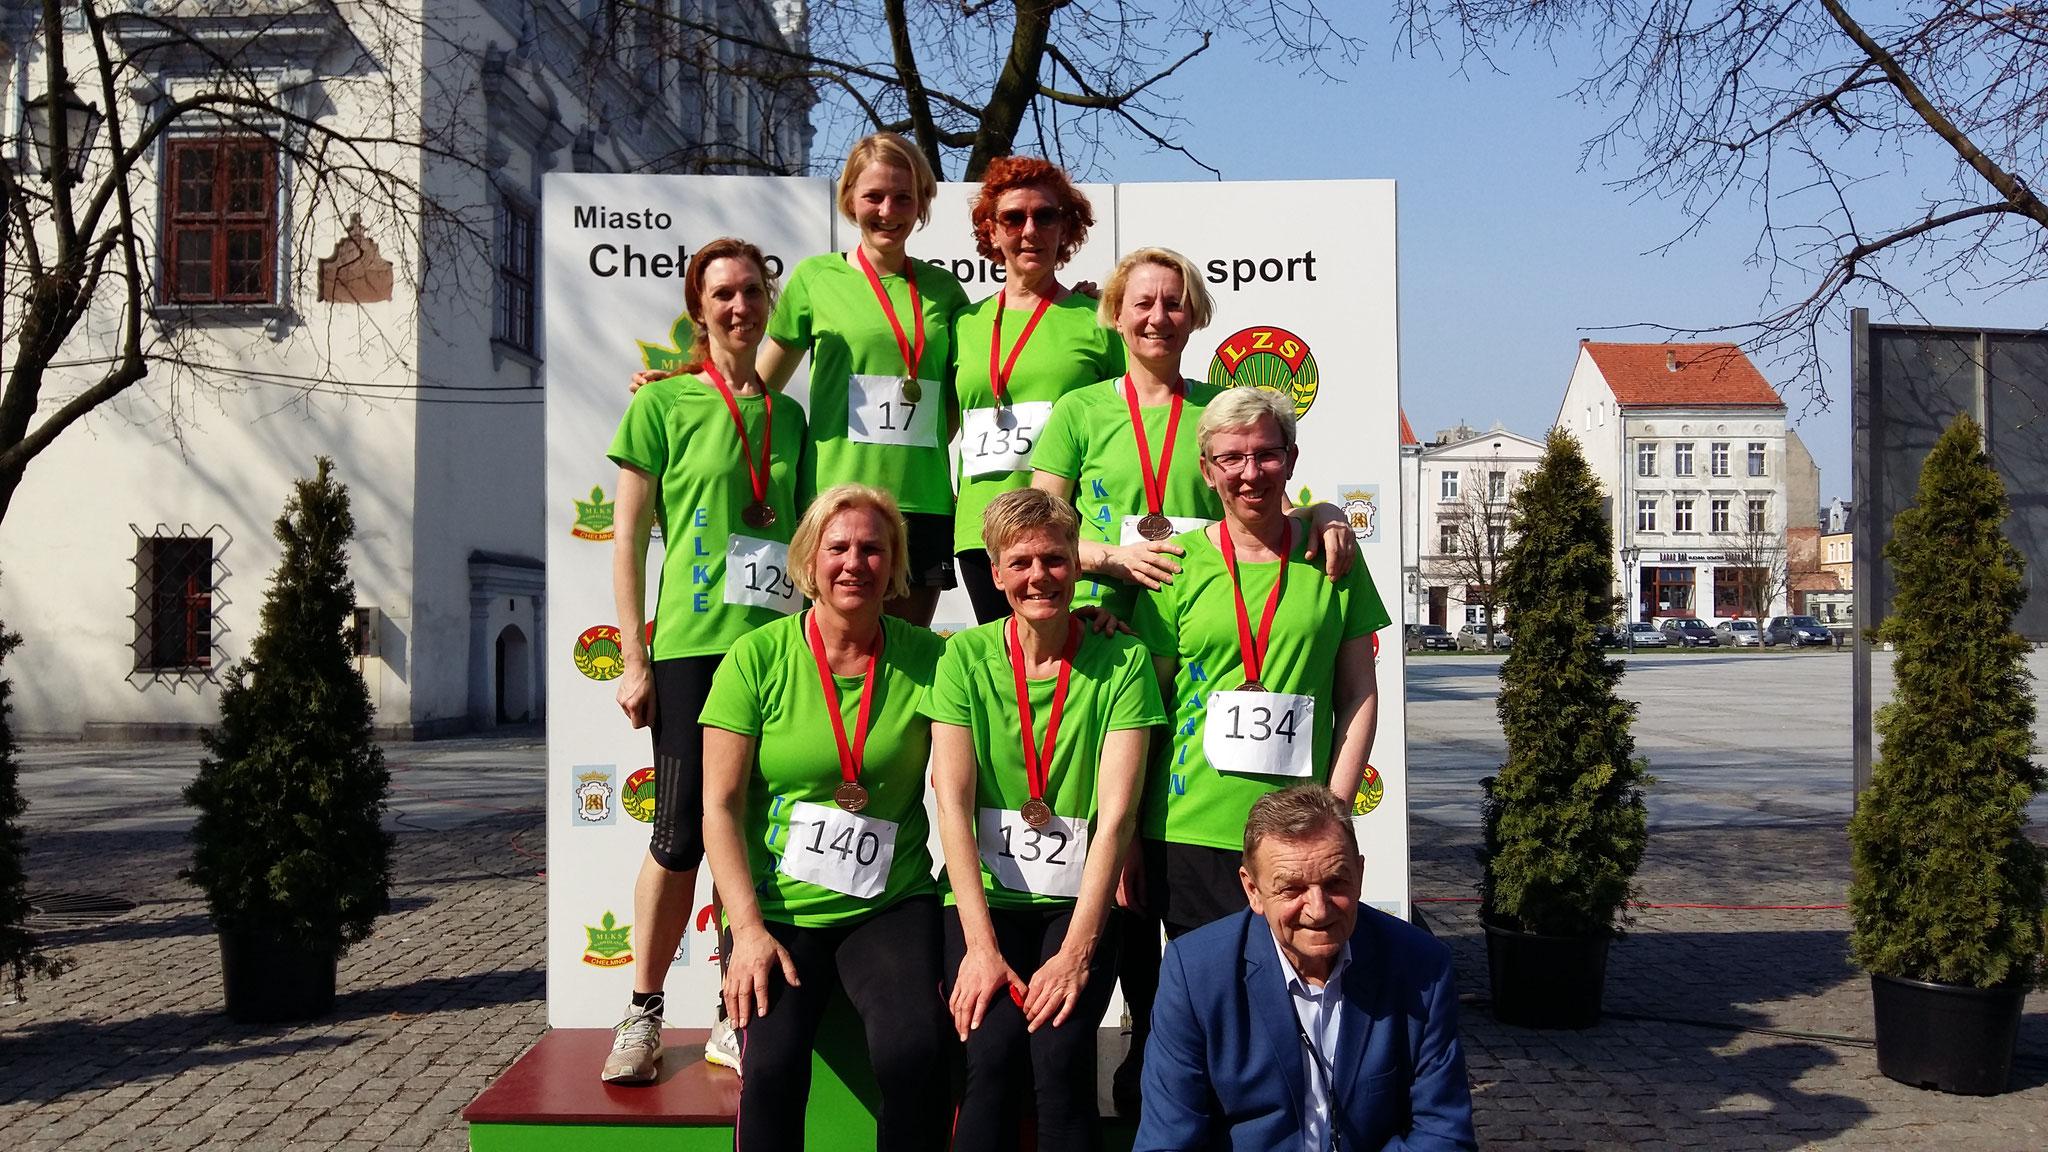 Mündener Läuferinnen beim Altstadtlauf in Chelmno